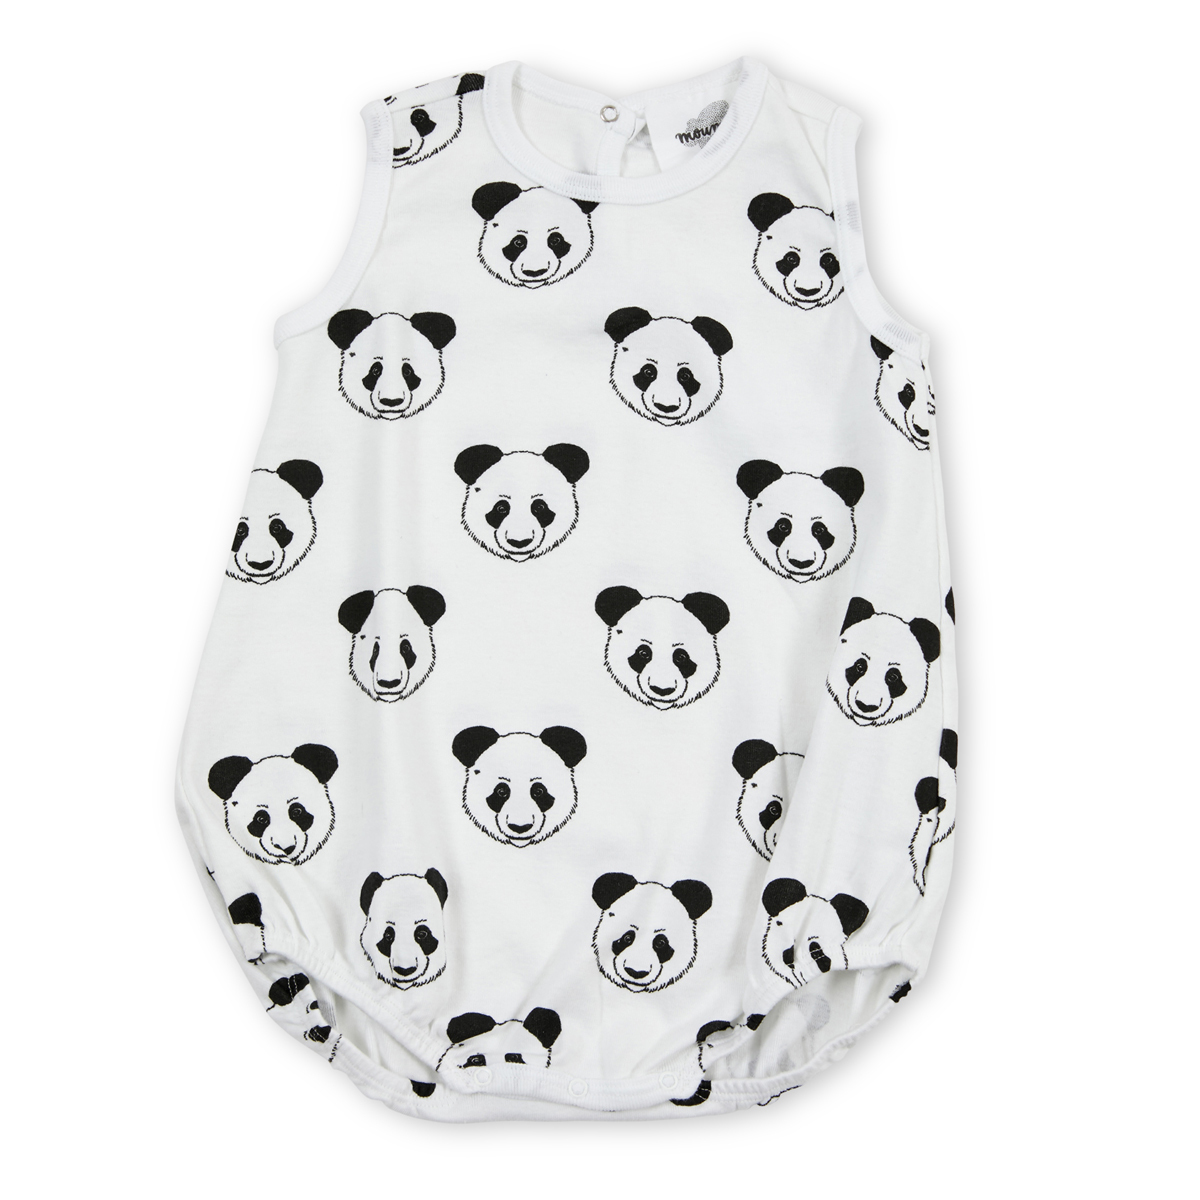 Robe & Combinaison Baba Barboteuse Panda - 12 Mois Baba Barboteuse Panda - 12 Mois